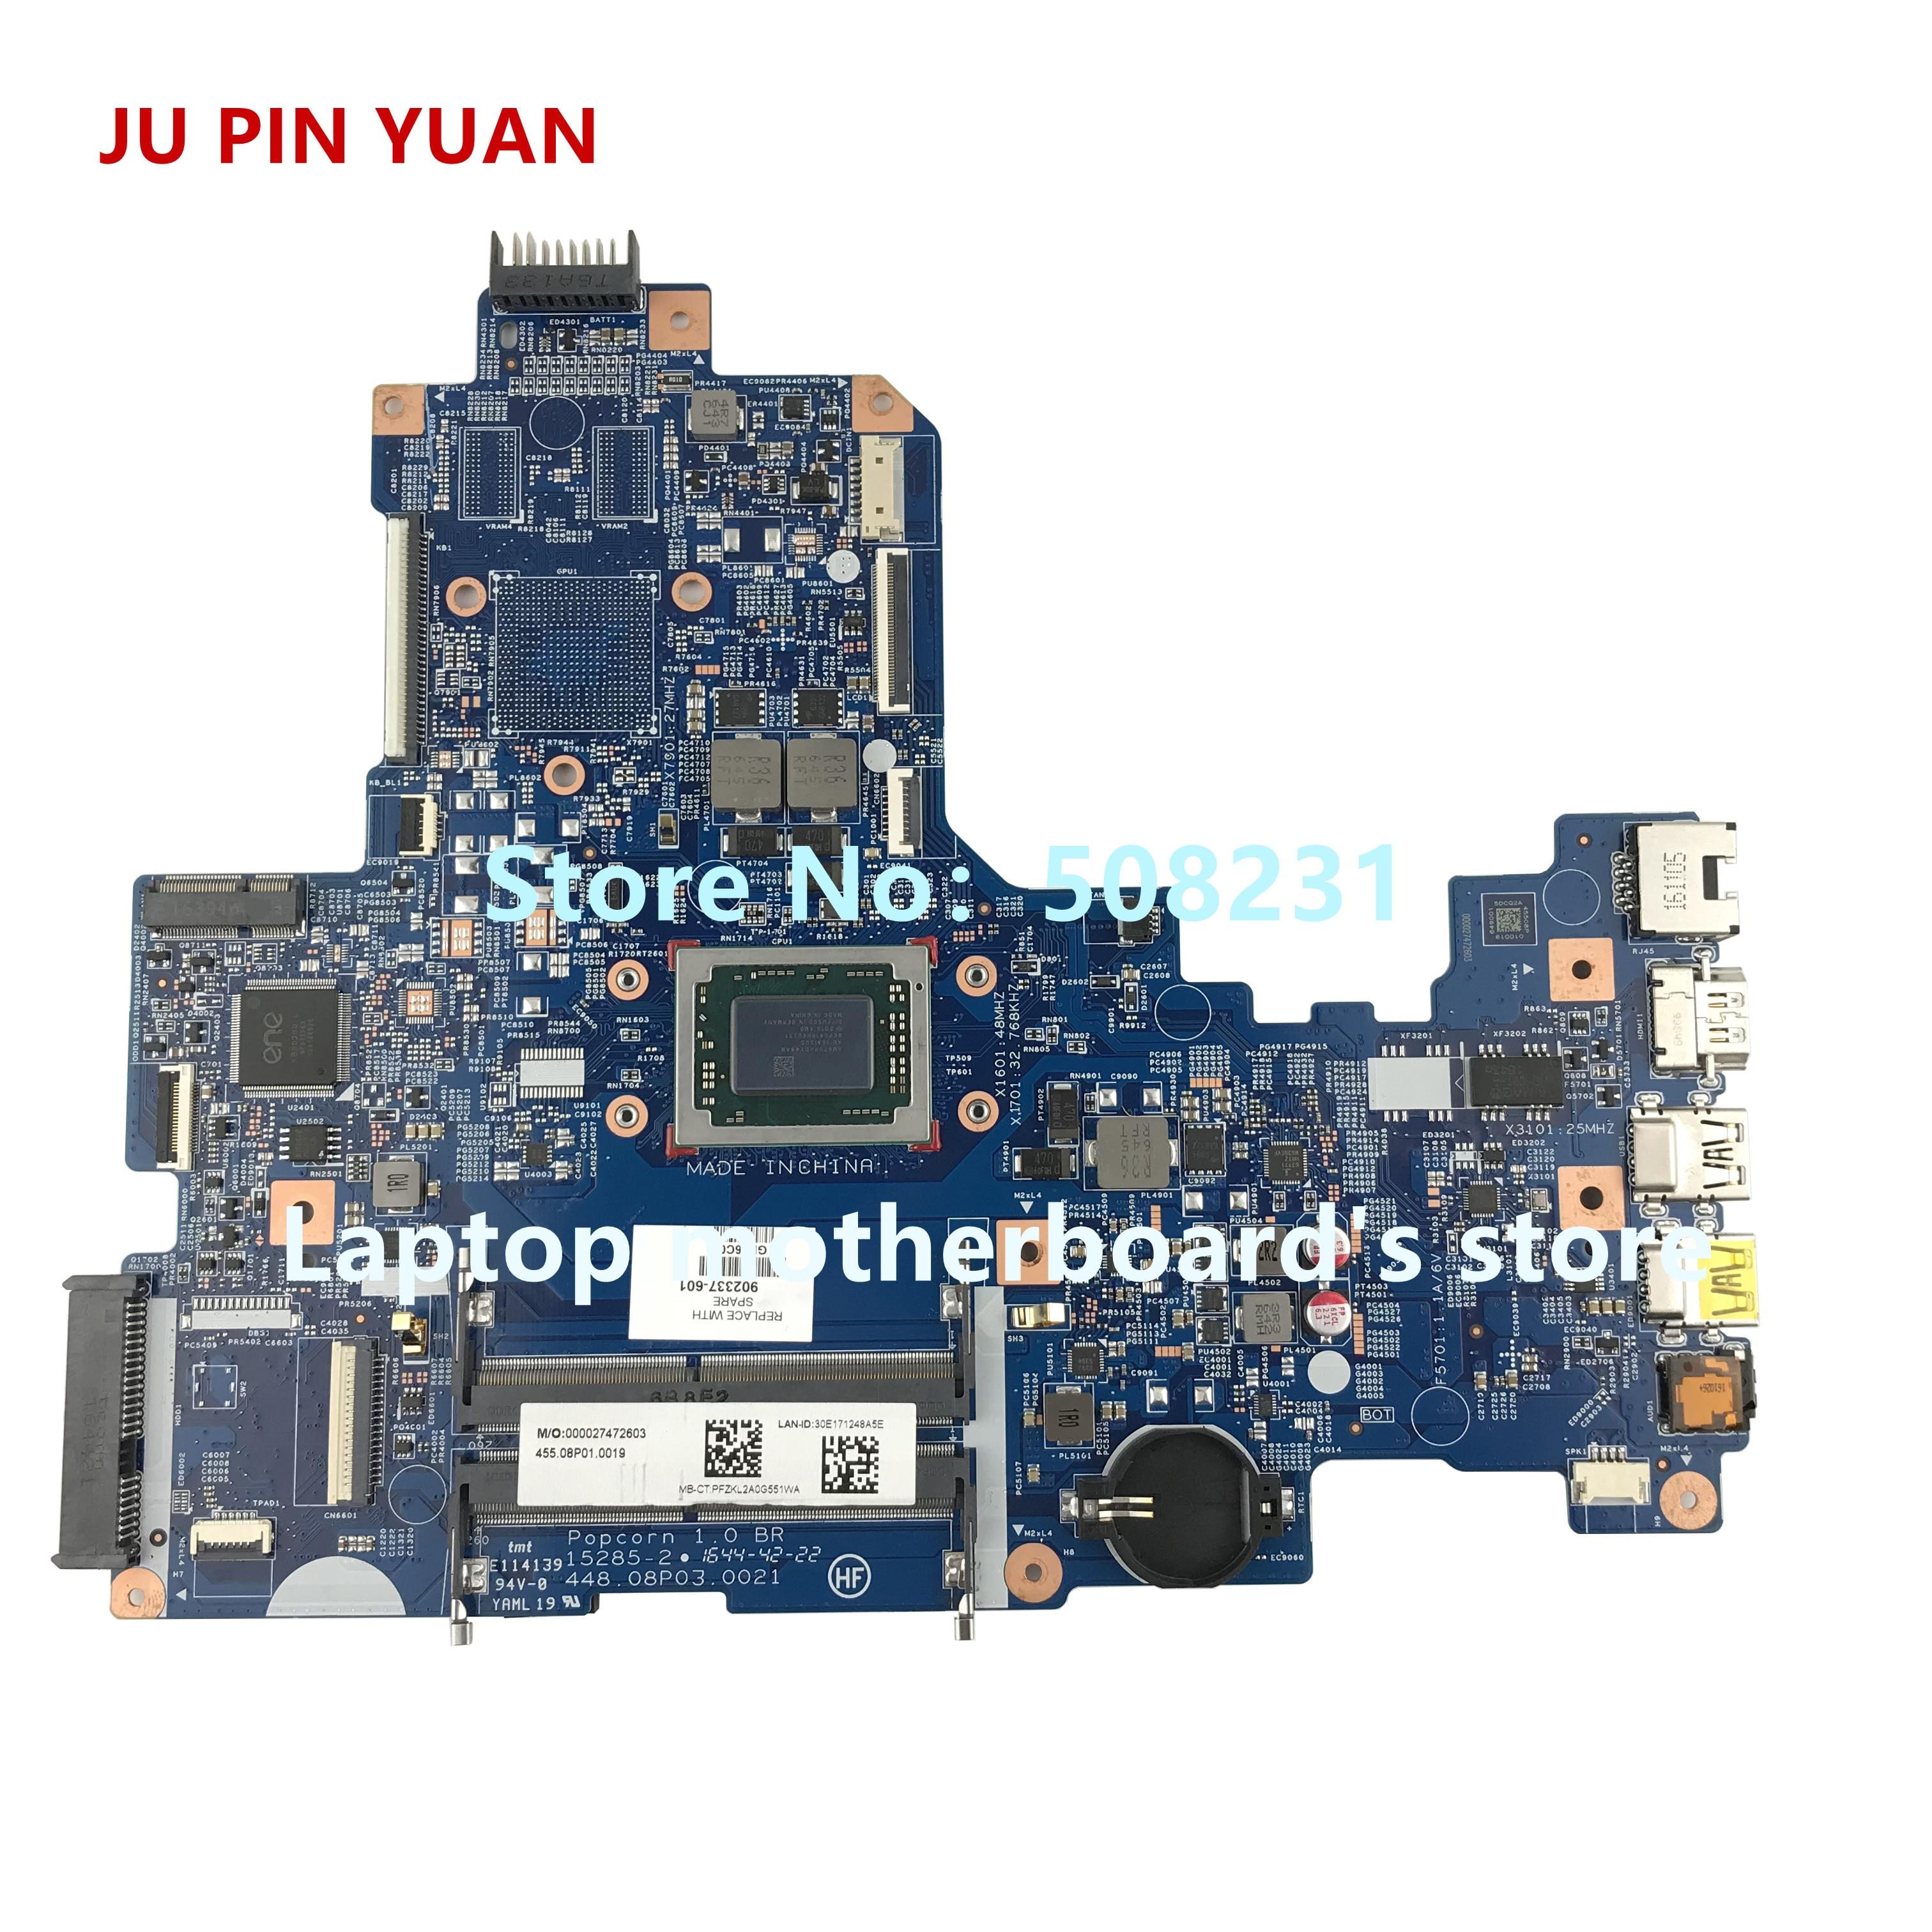 JU PIN YUAN 902337-601 902337-501 902337-001 448.08P03.0021 for HP NOTEBOOK 17-Y 17Z-Y laptop motherboard A12-9700P fully TestedJU PIN YUAN 902337-601 902337-501 902337-001 448.08P03.0021 for HP NOTEBOOK 17-Y 17Z-Y laptop motherboard A12-9700P fully Tested